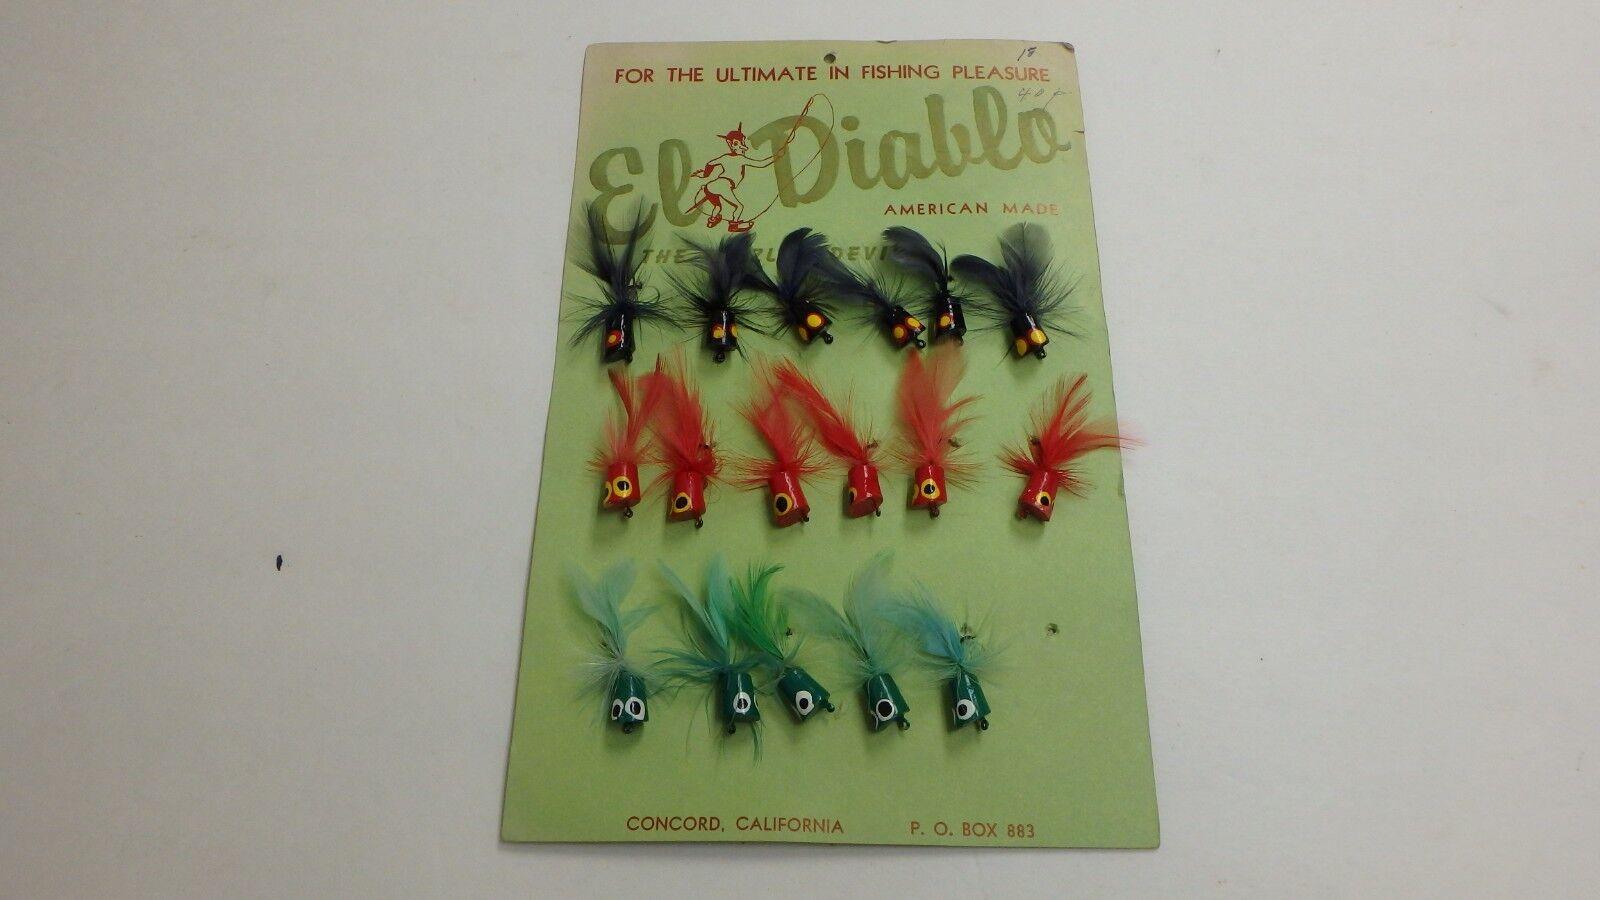 Vintage El Diablo Dealer Display voitured of 17 Flies Fly Rod Bait Fishing Assorted